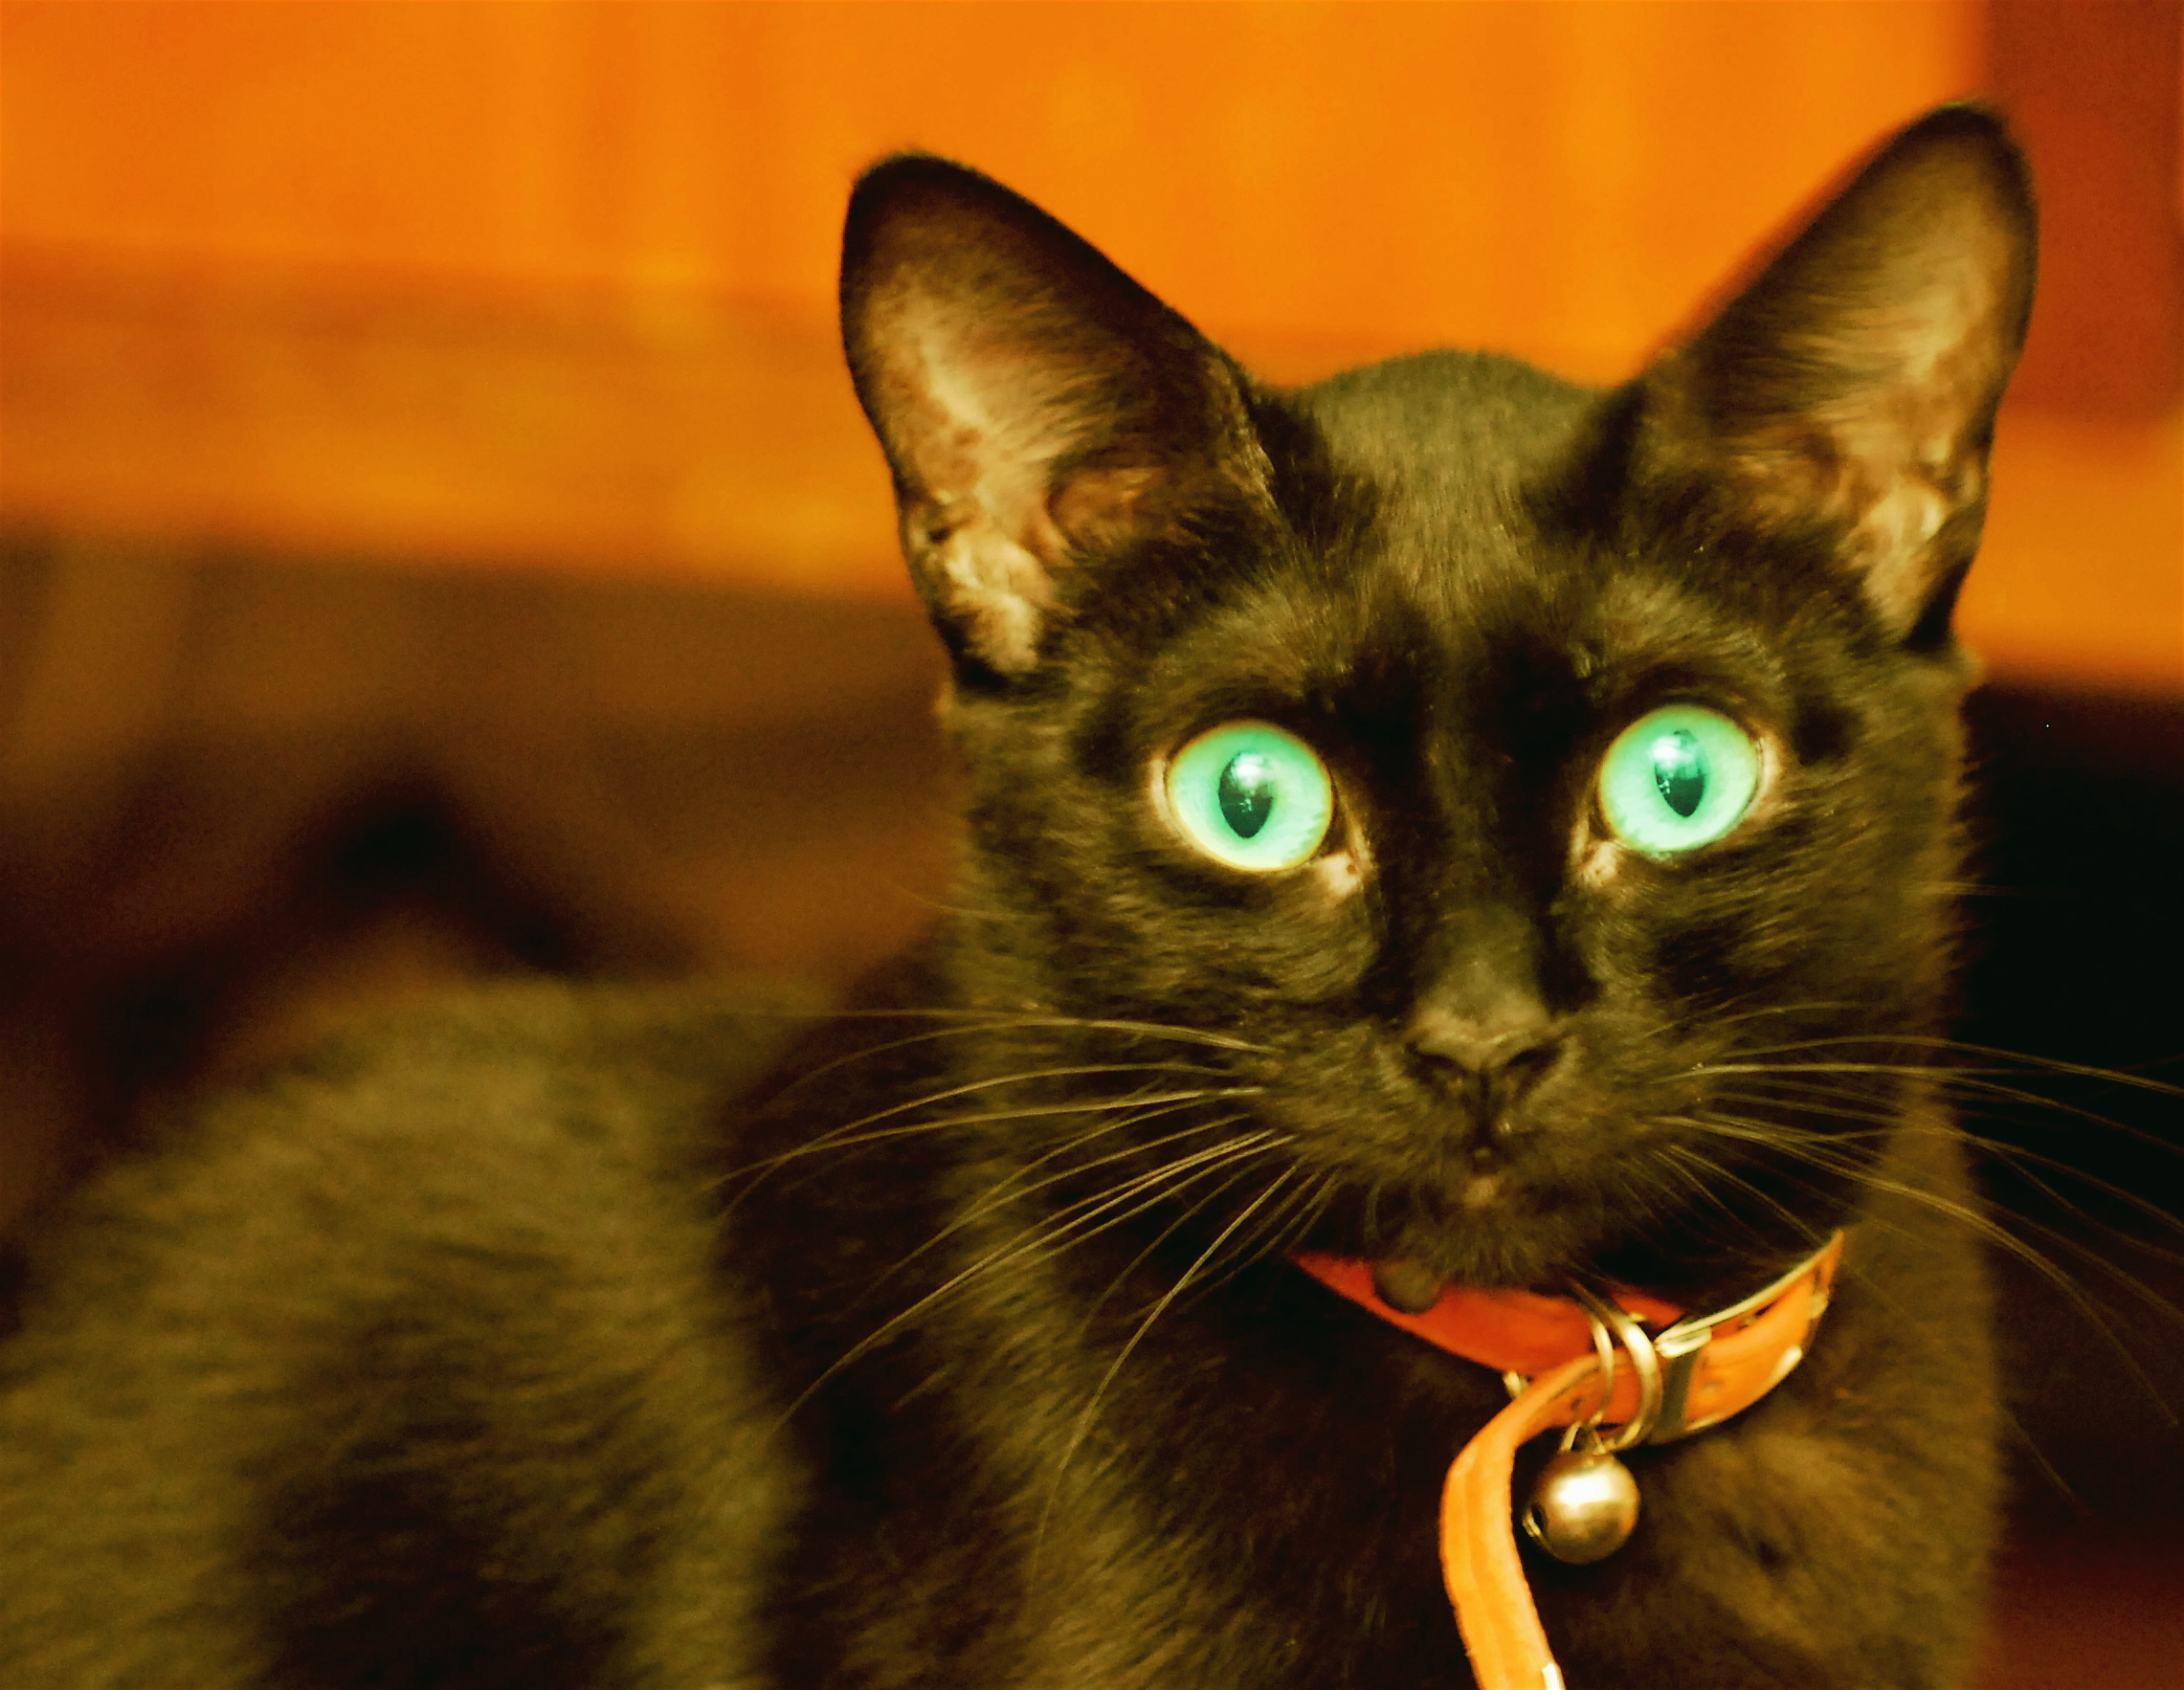 Photo Credit: Astonished Black Cat |Pedro Ribeiro Simões| Flickr Creative Commons | Attribution License (c)